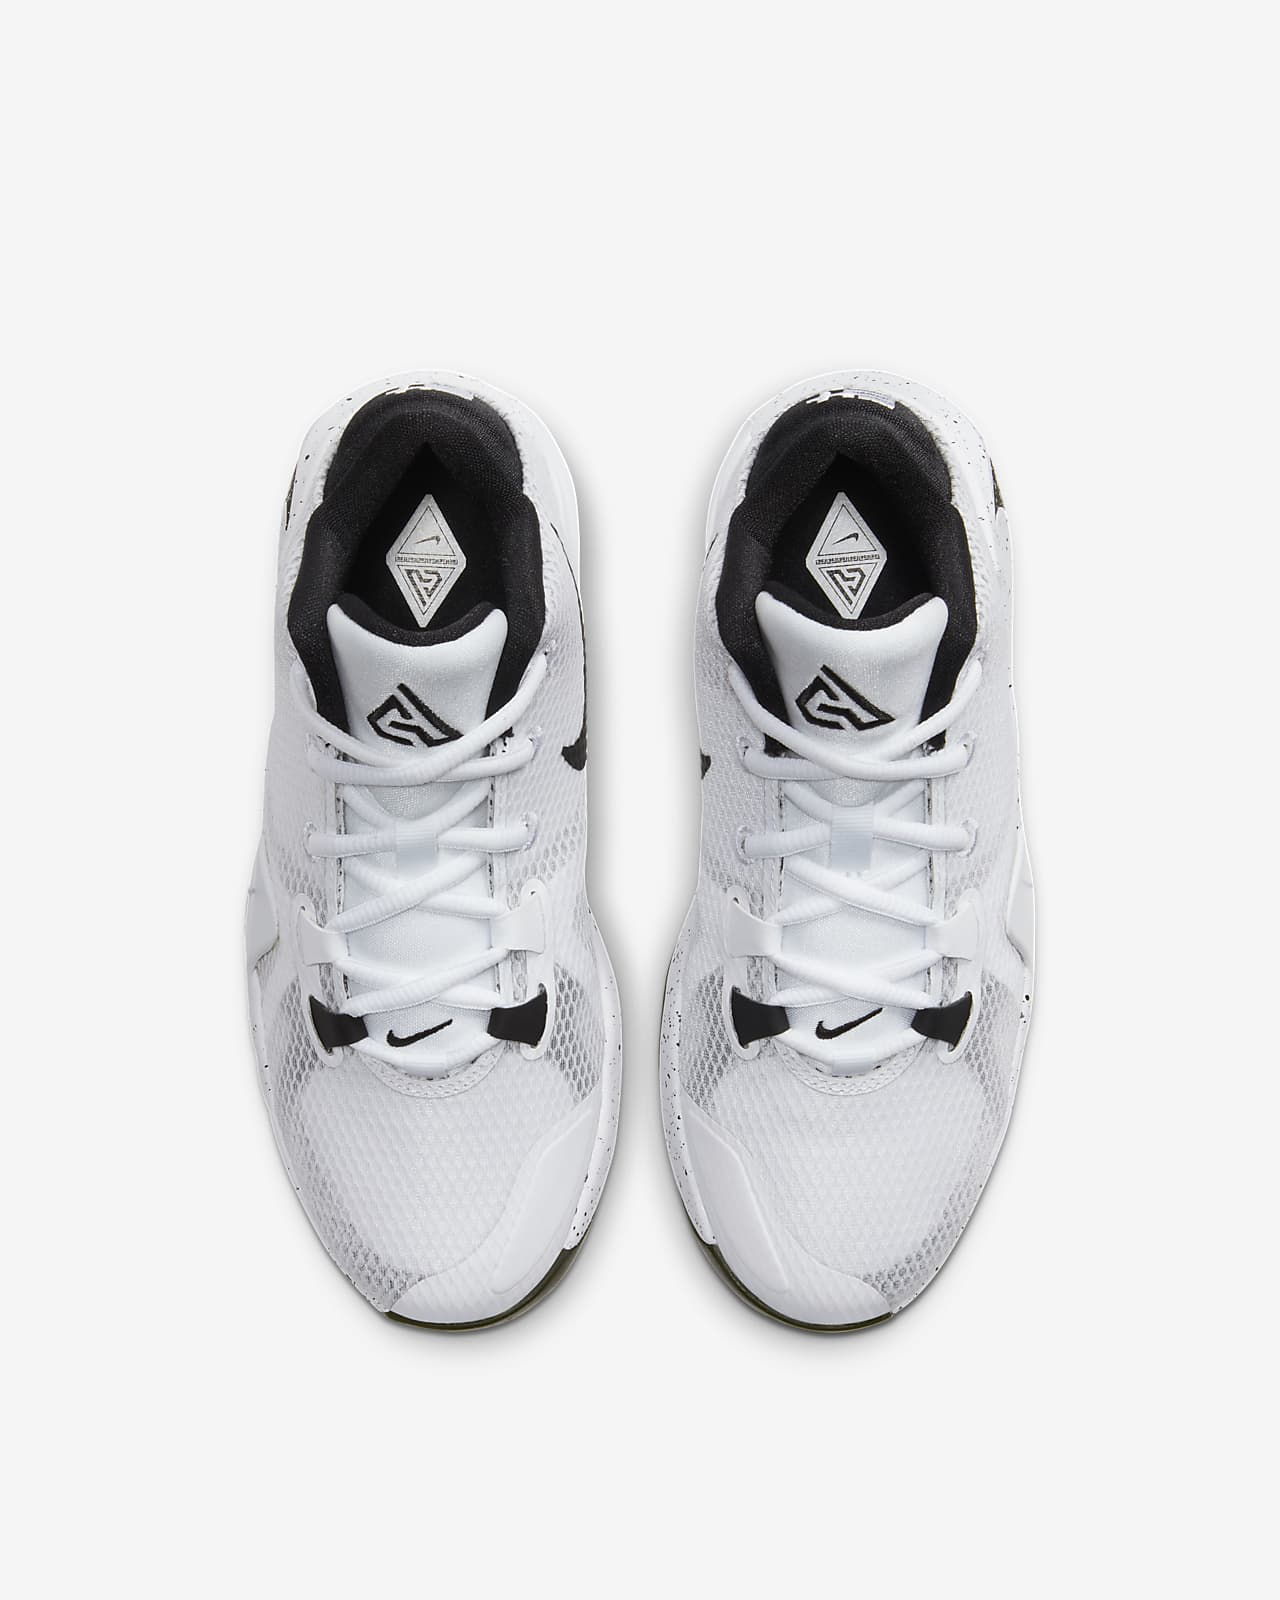 Freak 1 Big Kids' Shoe. Nike.com